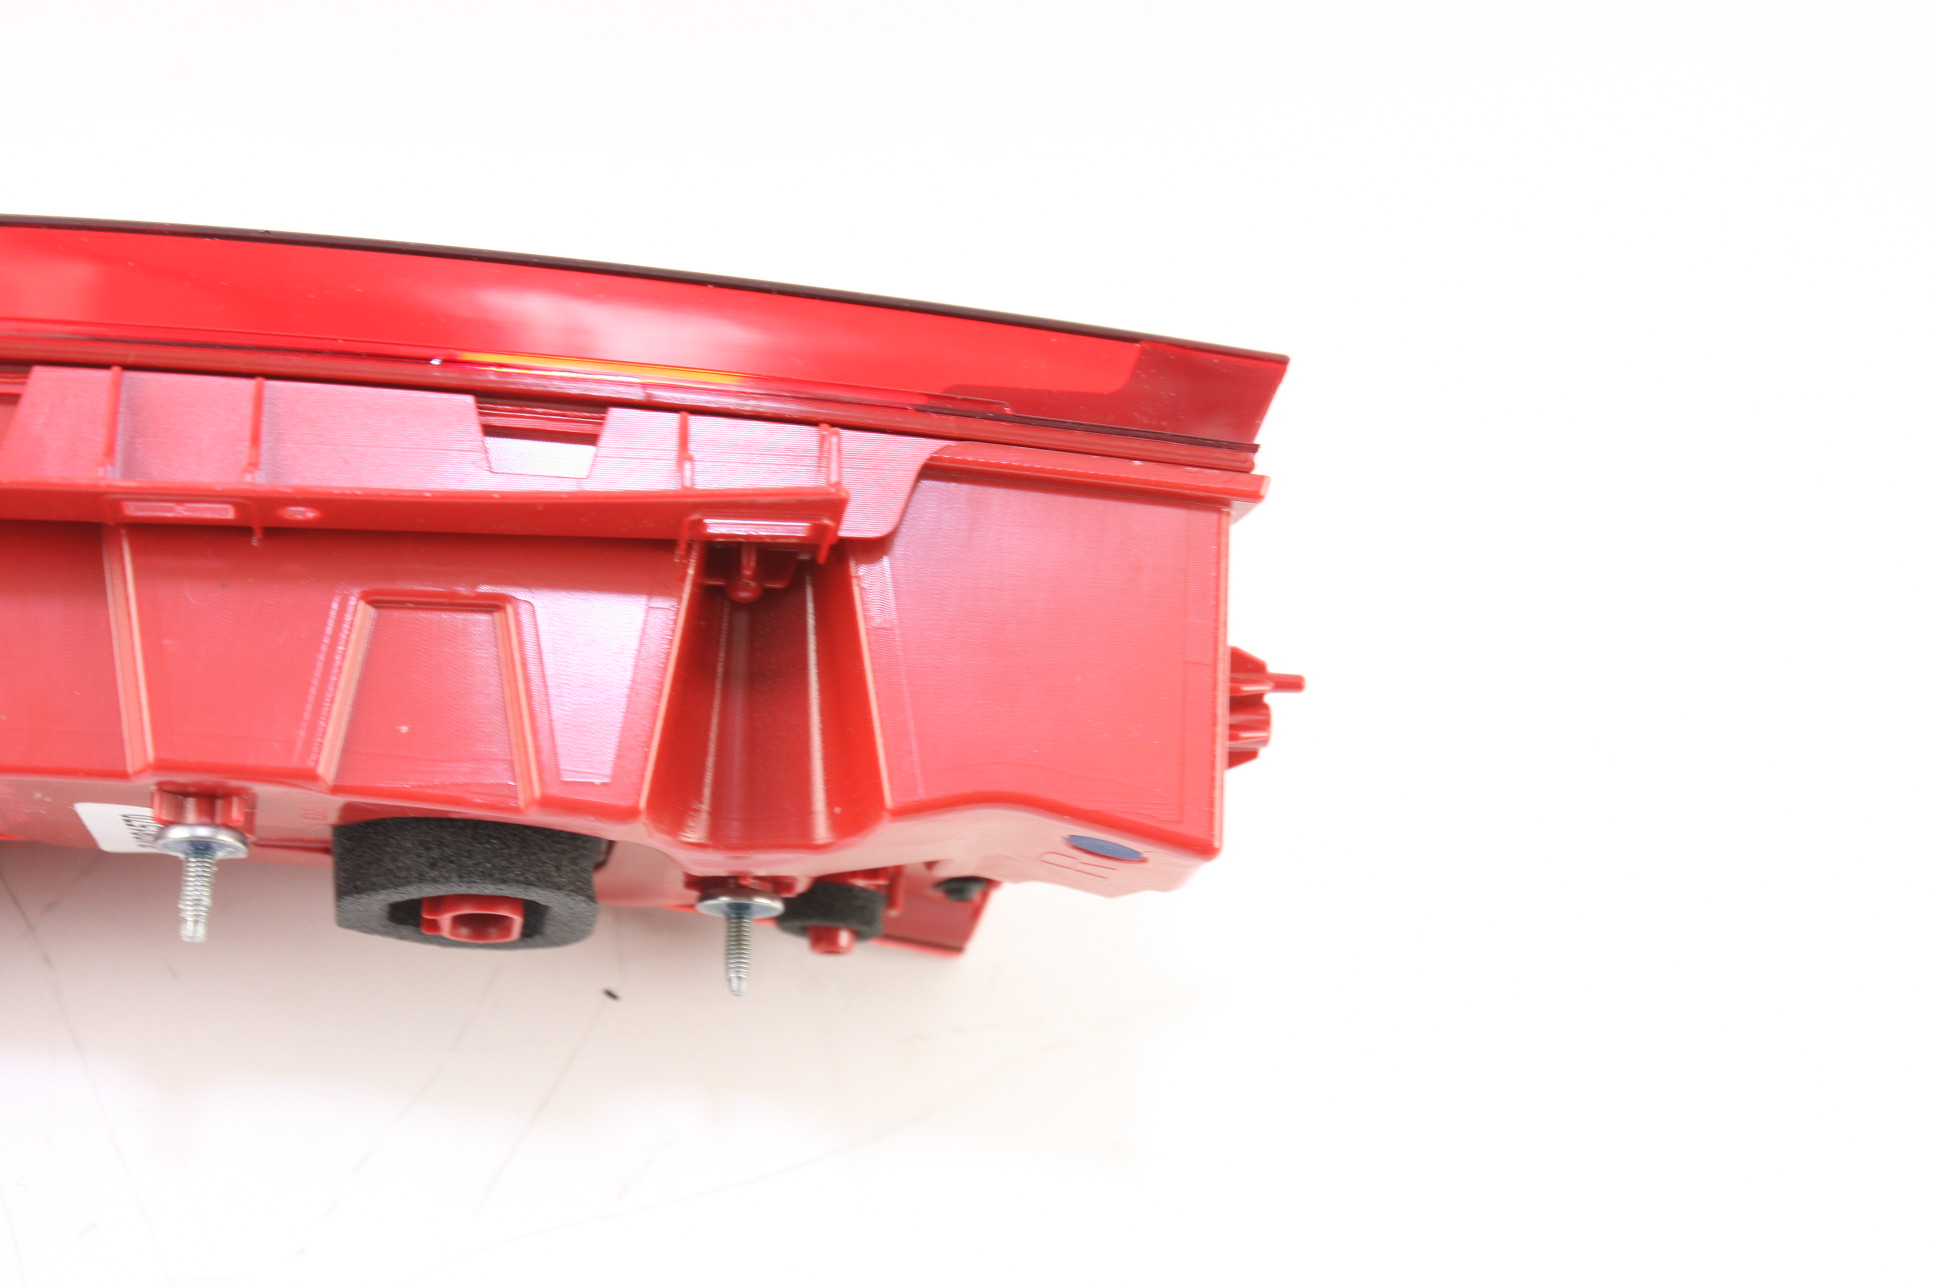 New OEM 84081570 Genuine GM 13-18 Cadillac ATS Sedan Tail Light Passenger Side - image 10